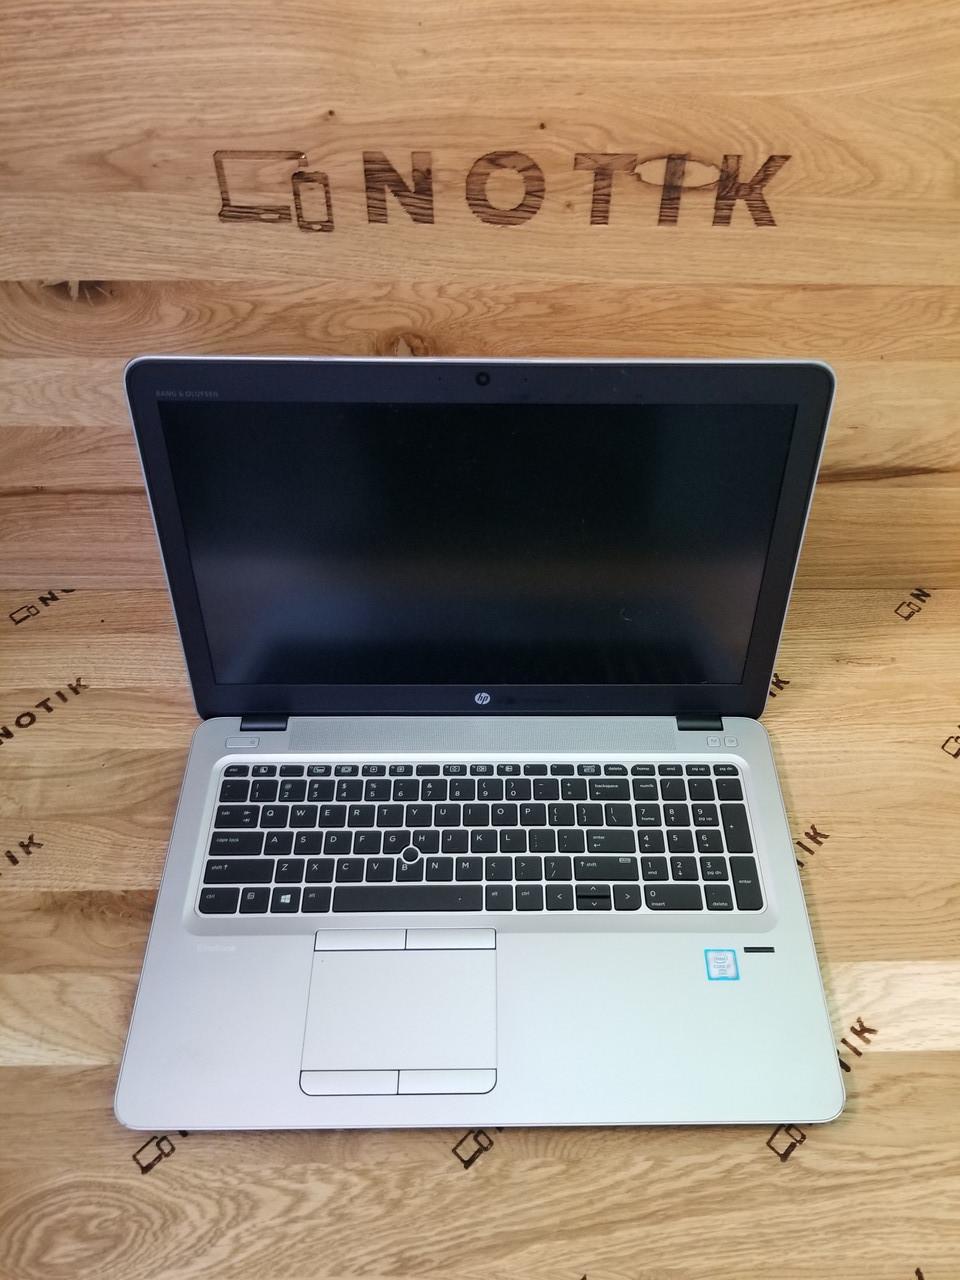 HP EliteBook 850 g3 i7-6600U 2.6GHz/16Gb/256 Gb SSD/Intel HD 520+AMD R7 M350/Full HD 1920*1080 підсвітка